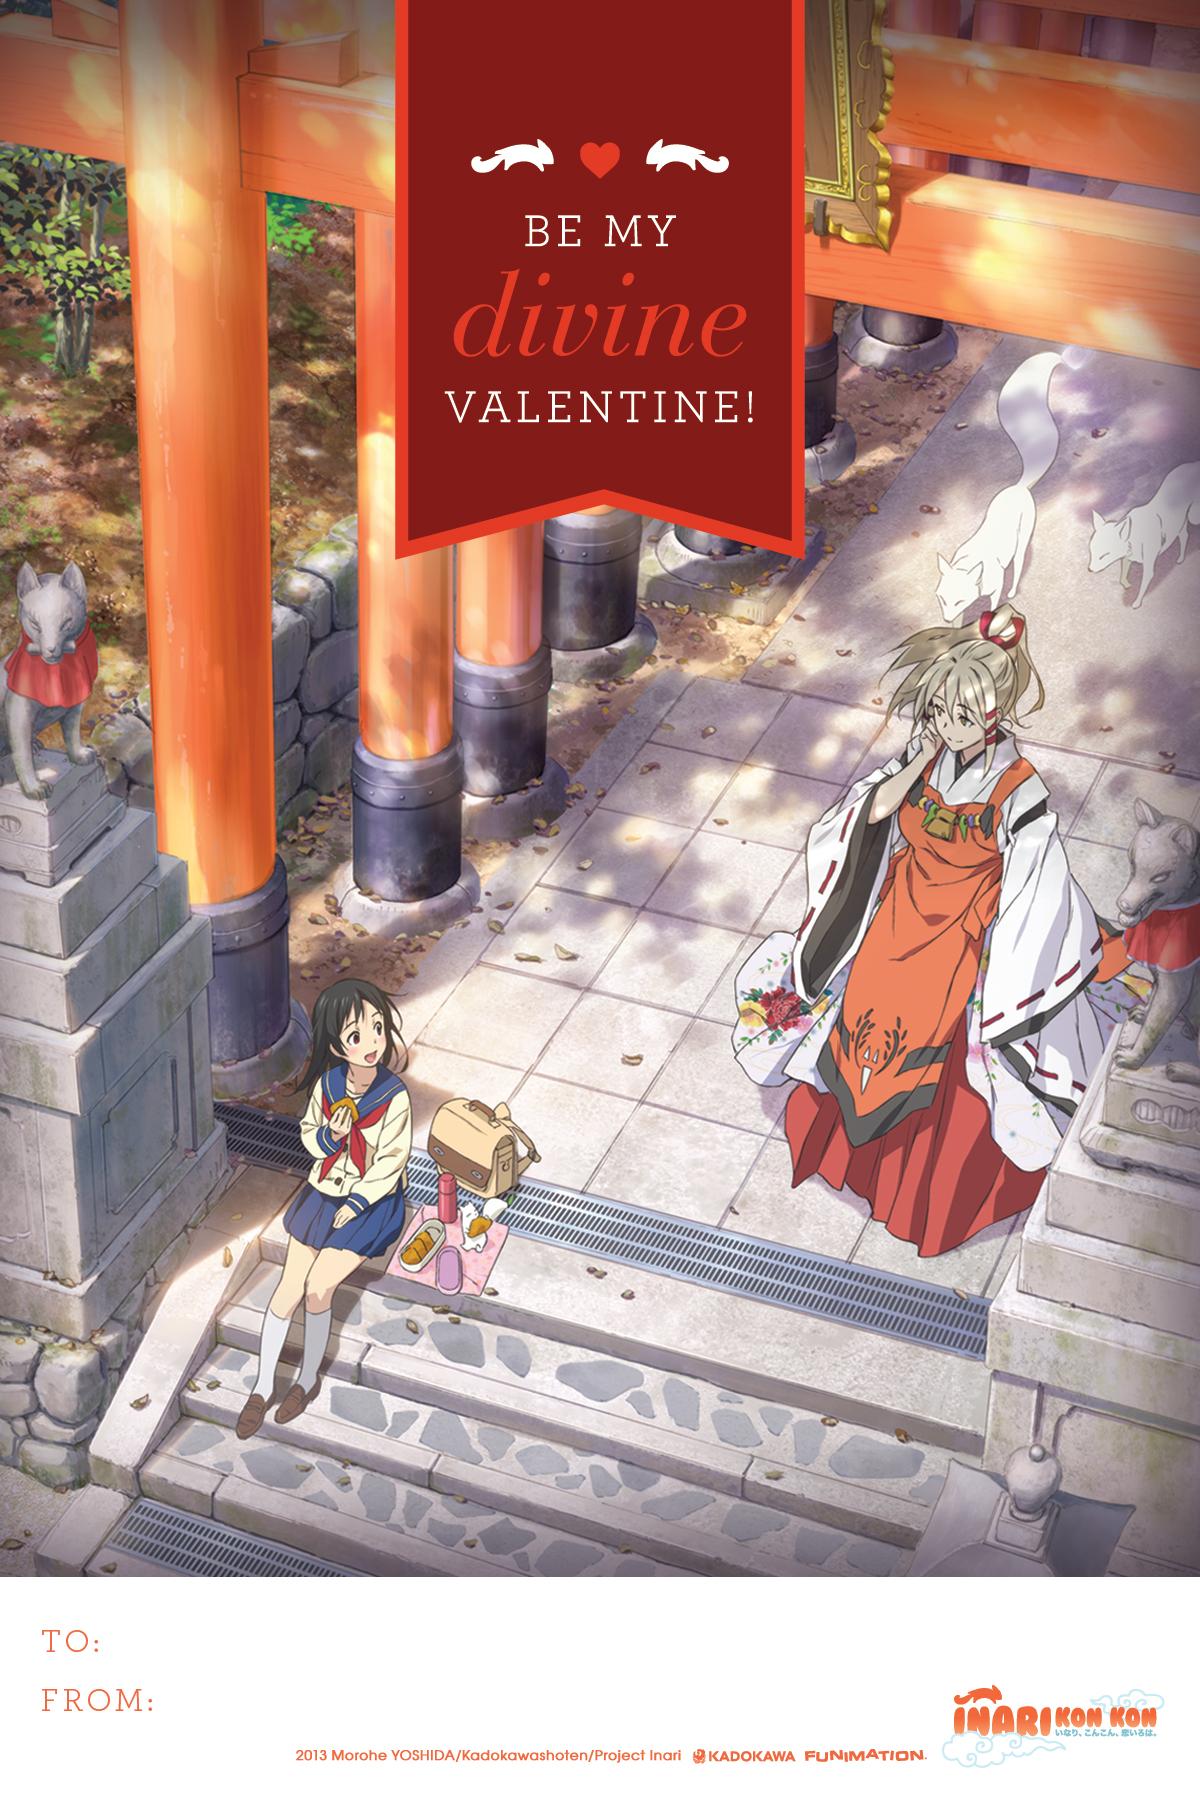 Anime Valentine's Day Cards haruhichan.com Inari Konkon Koi Iroha